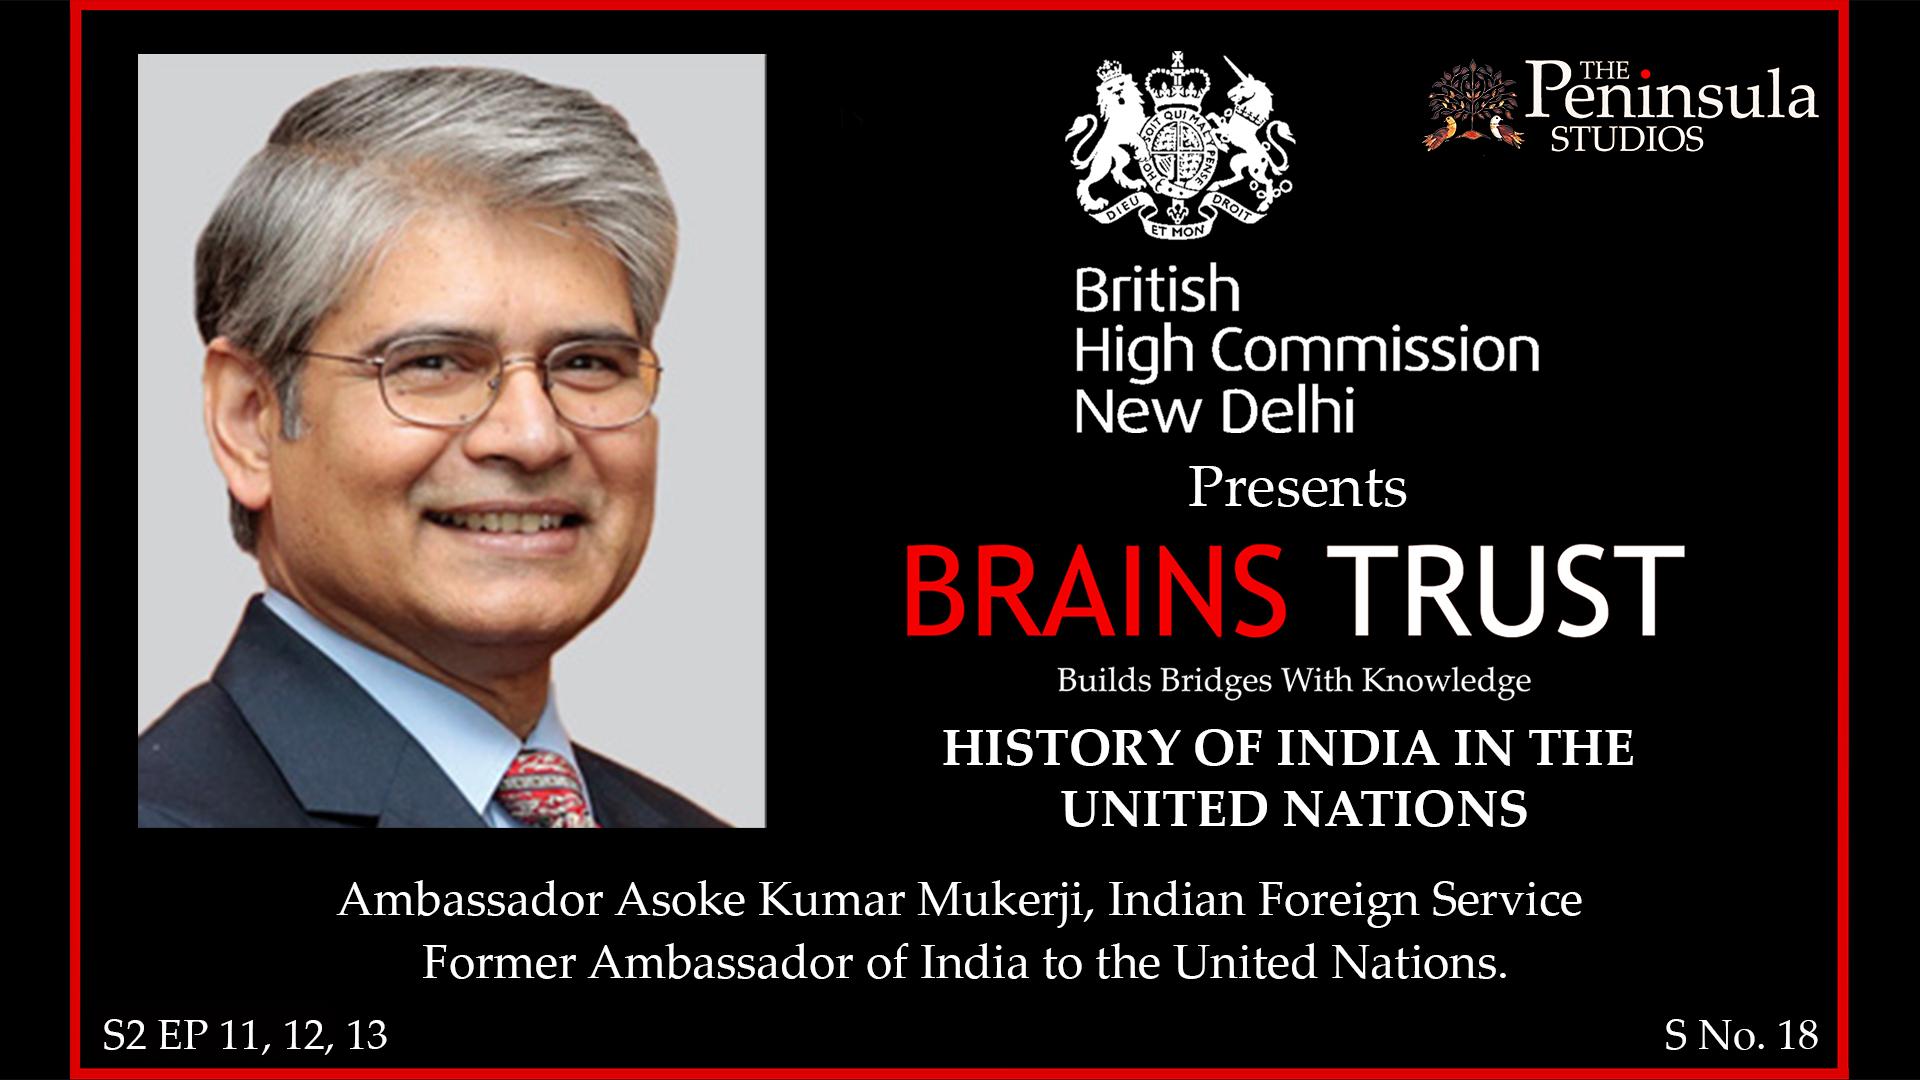 Asoke Kumar Mukerji